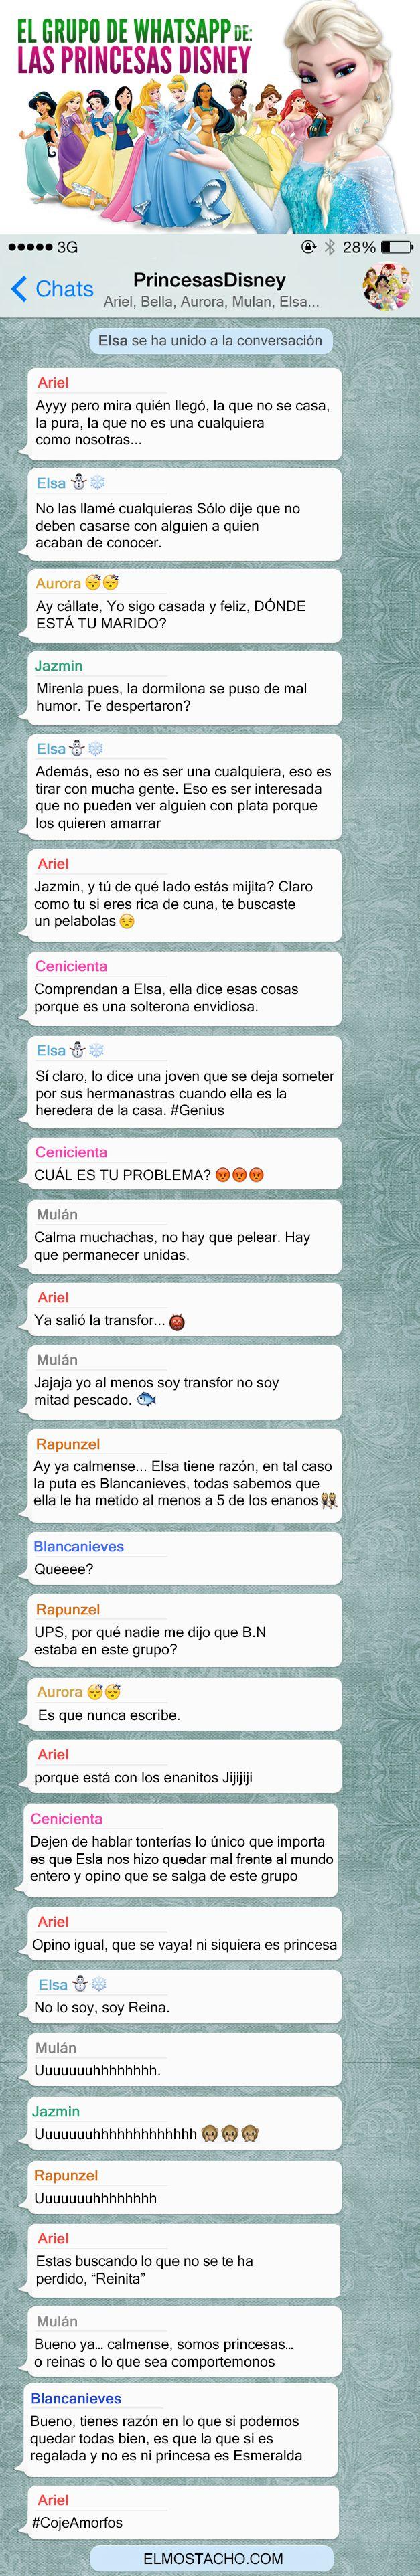 Of the princess of Disney had WhatsApp (Spanish)